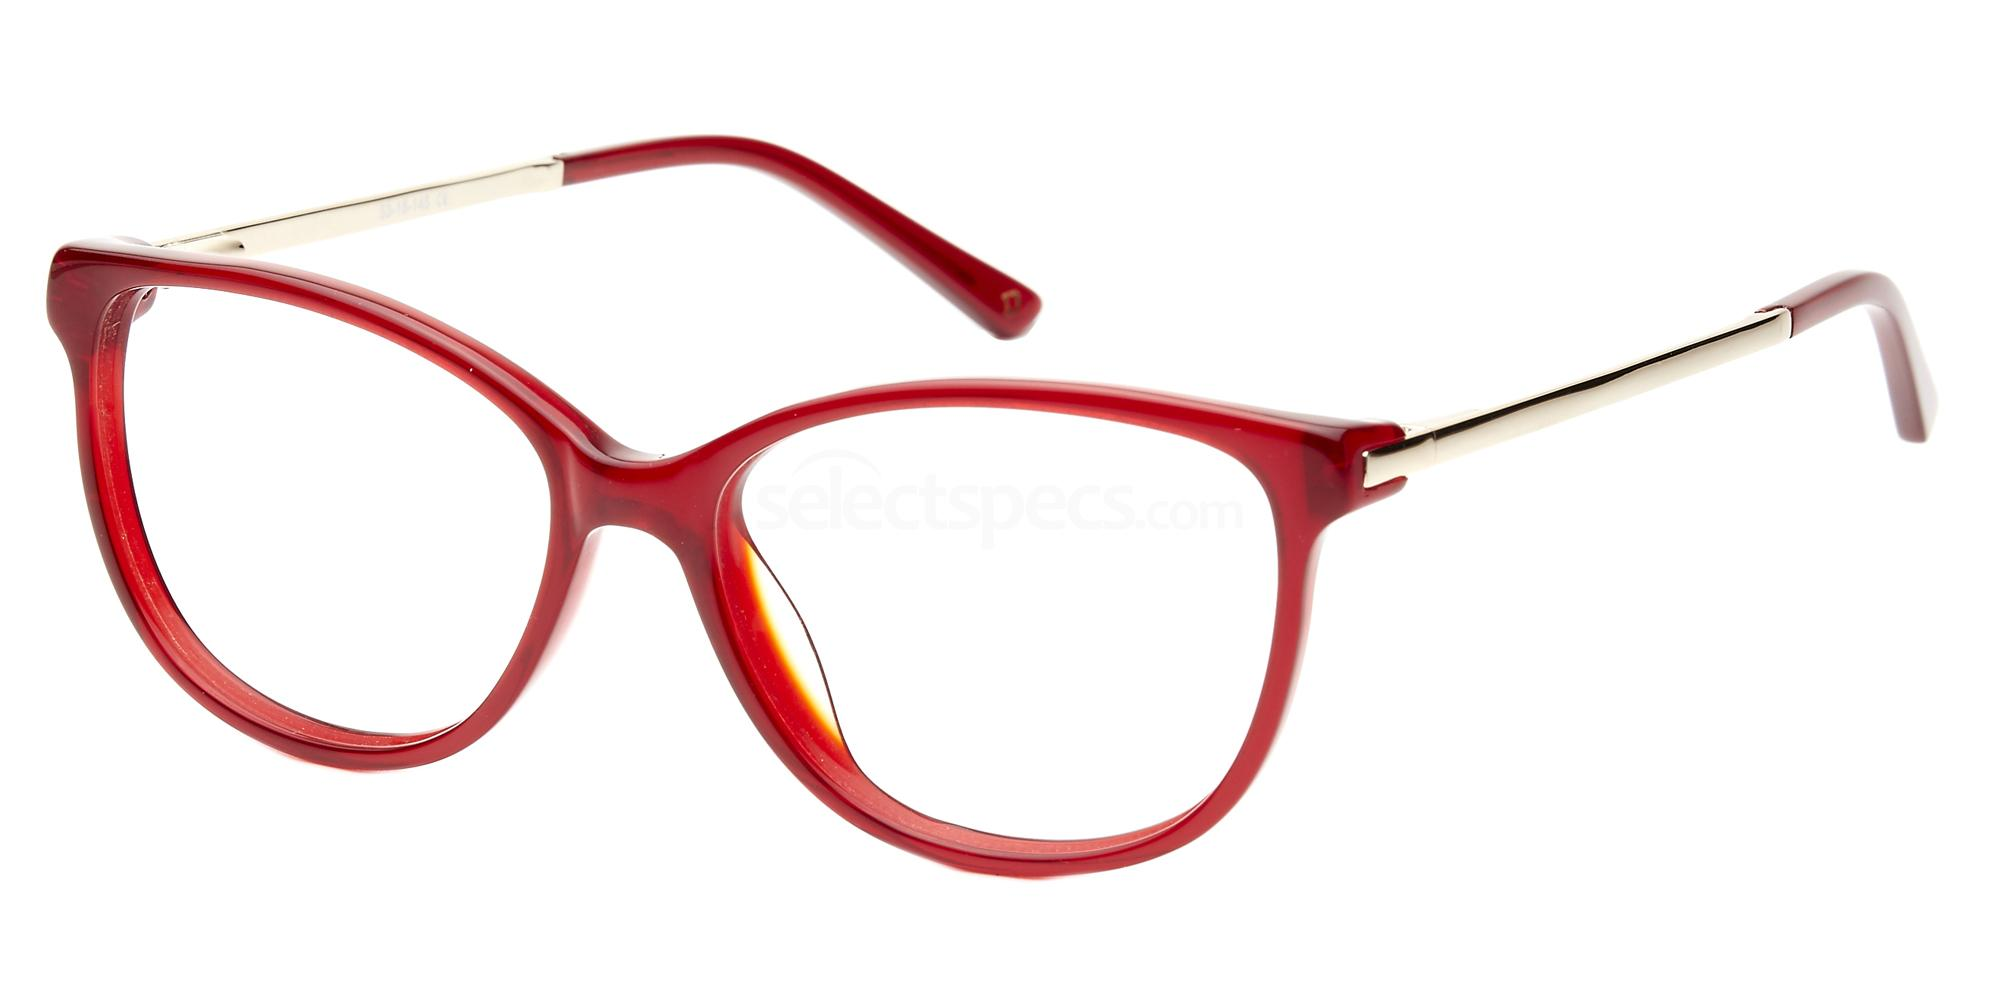 C1 DUN015 Glasses, Dune